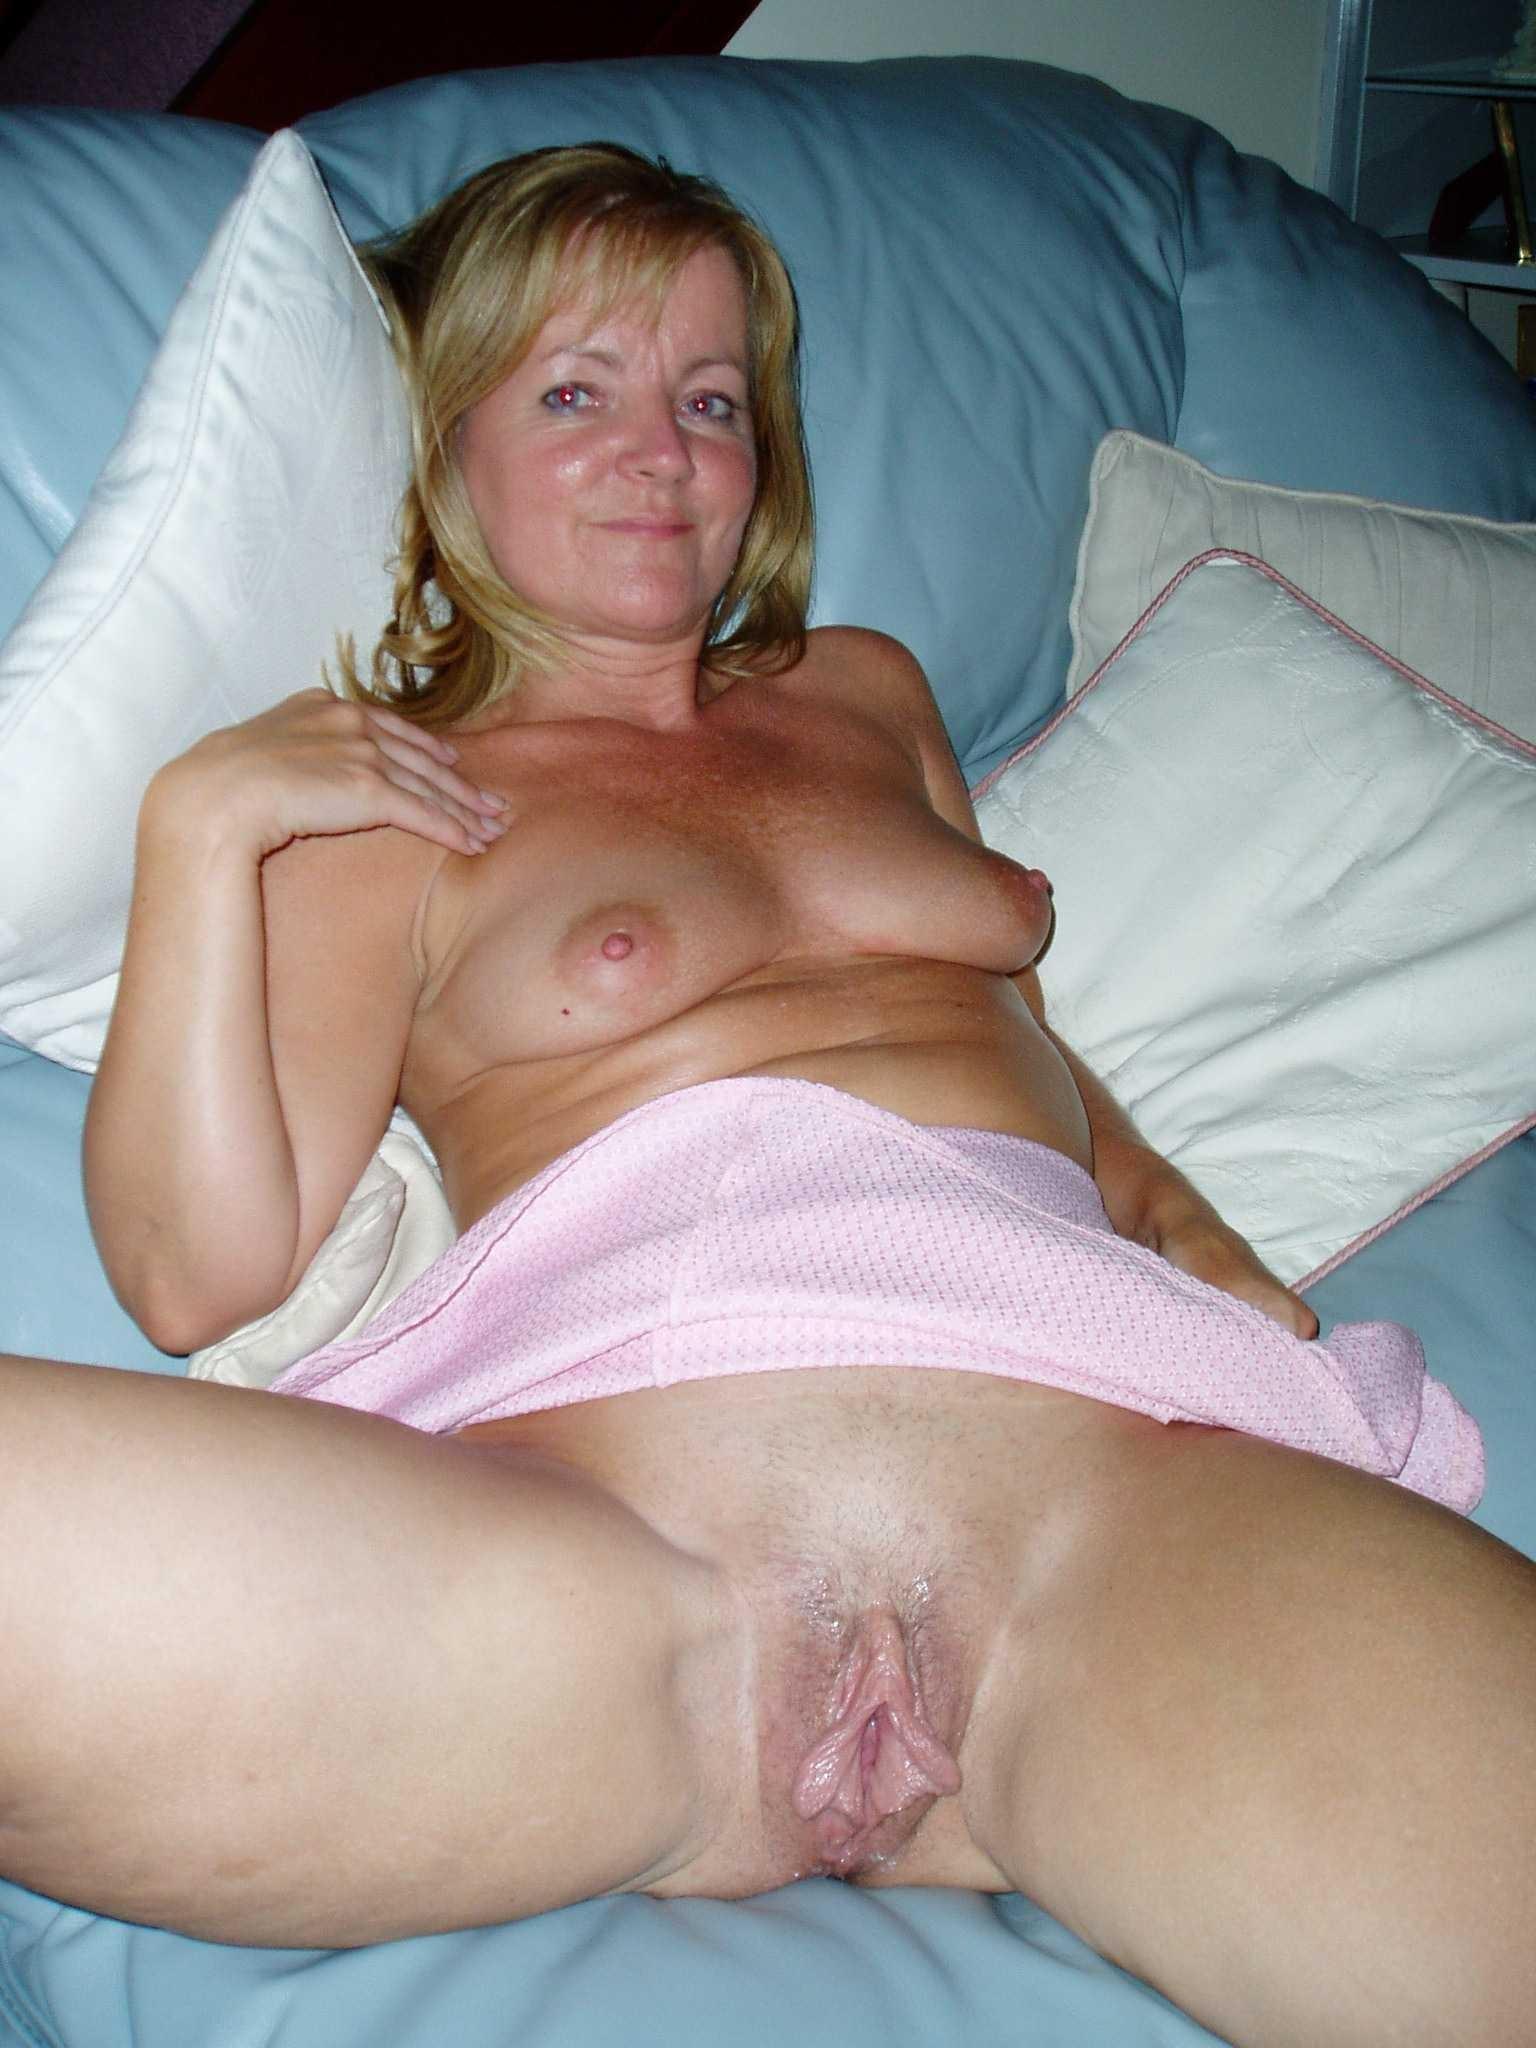 Milf Mom S Amateur Porn Photo Hot Milfs Moms Cougars